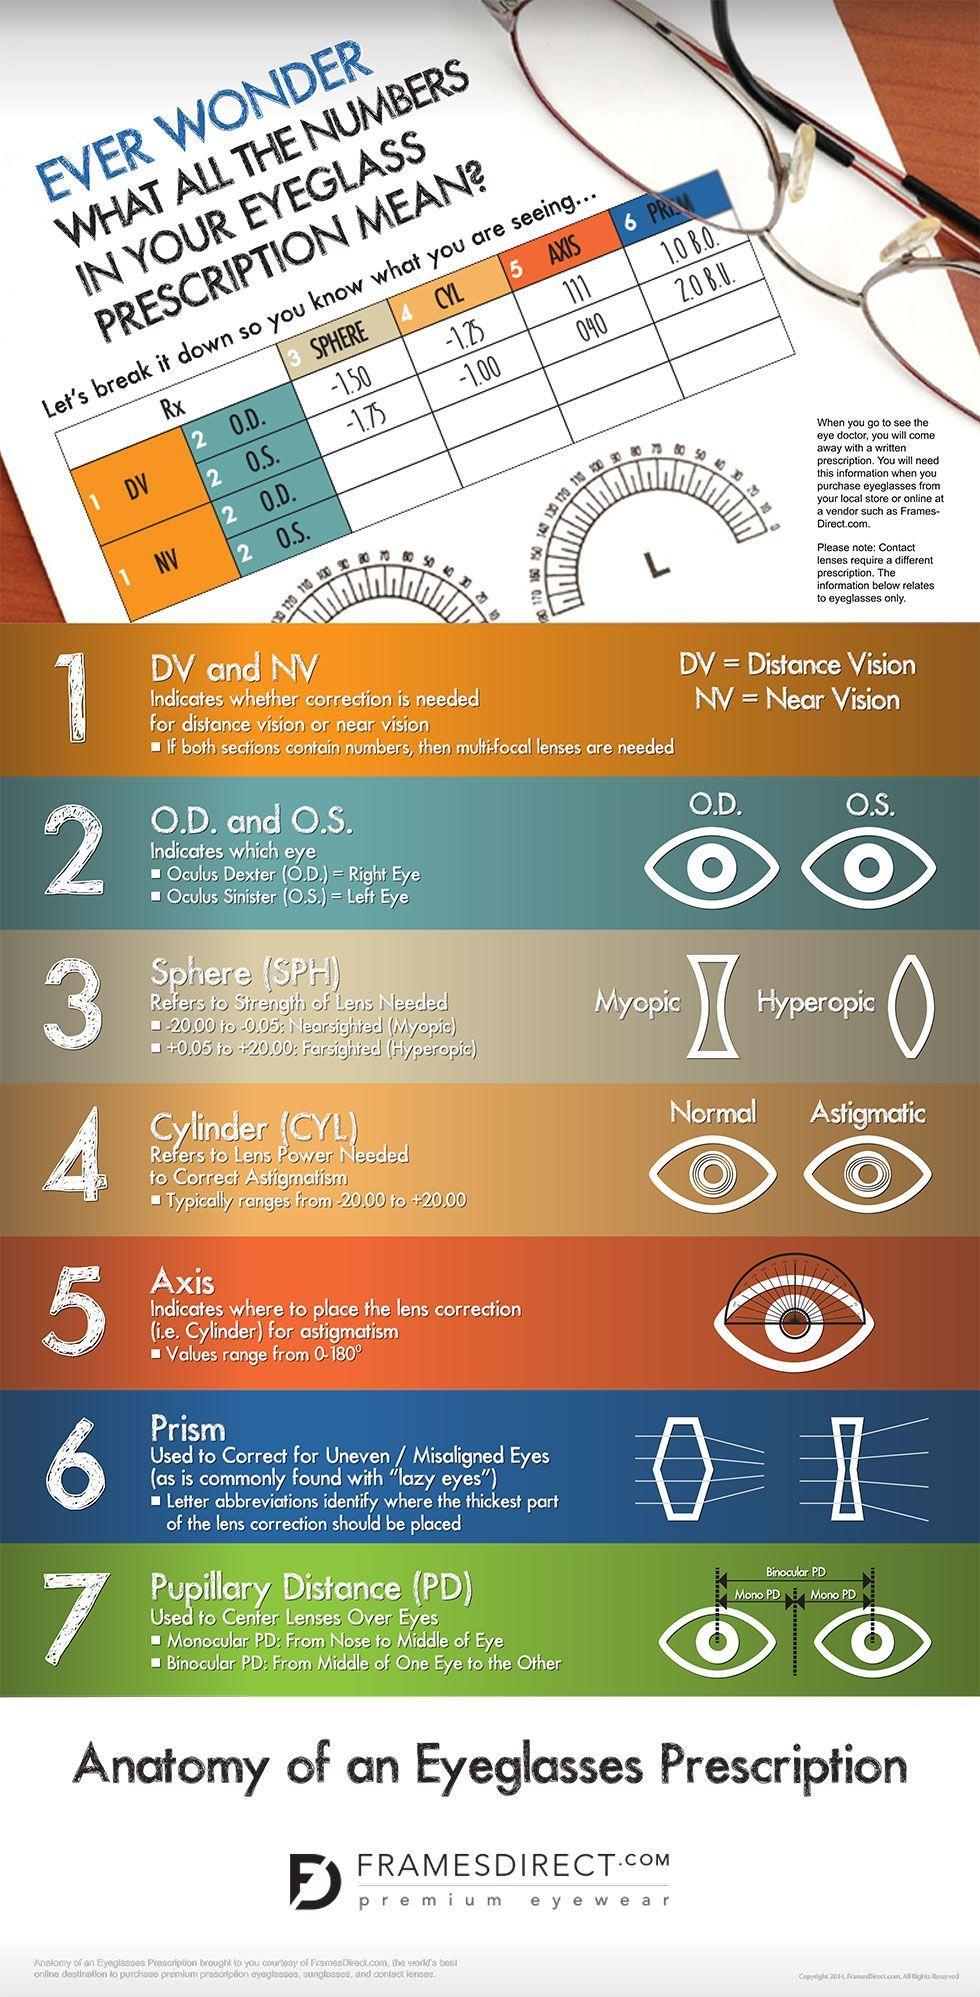 Understanding Your Eyewear Prescription By Framesdirect Com Eye Prescription Prescription Medical Knowledge